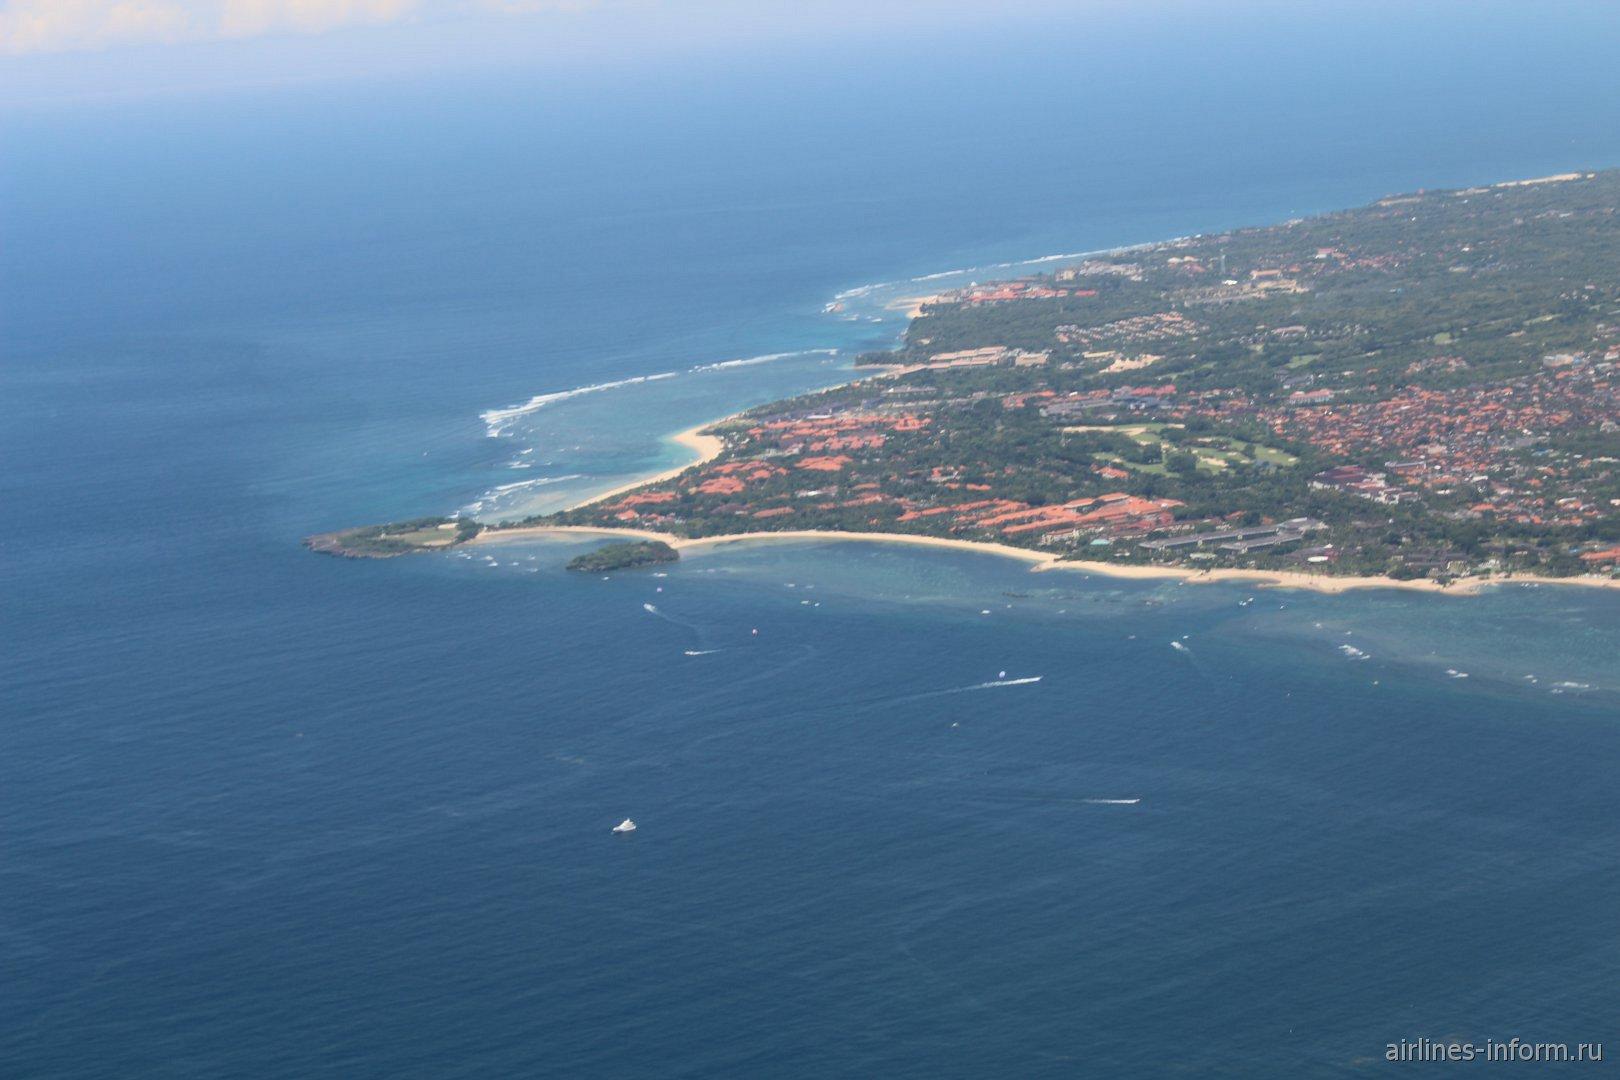 Вид на пляжи Бали при взлете из аэропорта Денпасар Нгура Рай